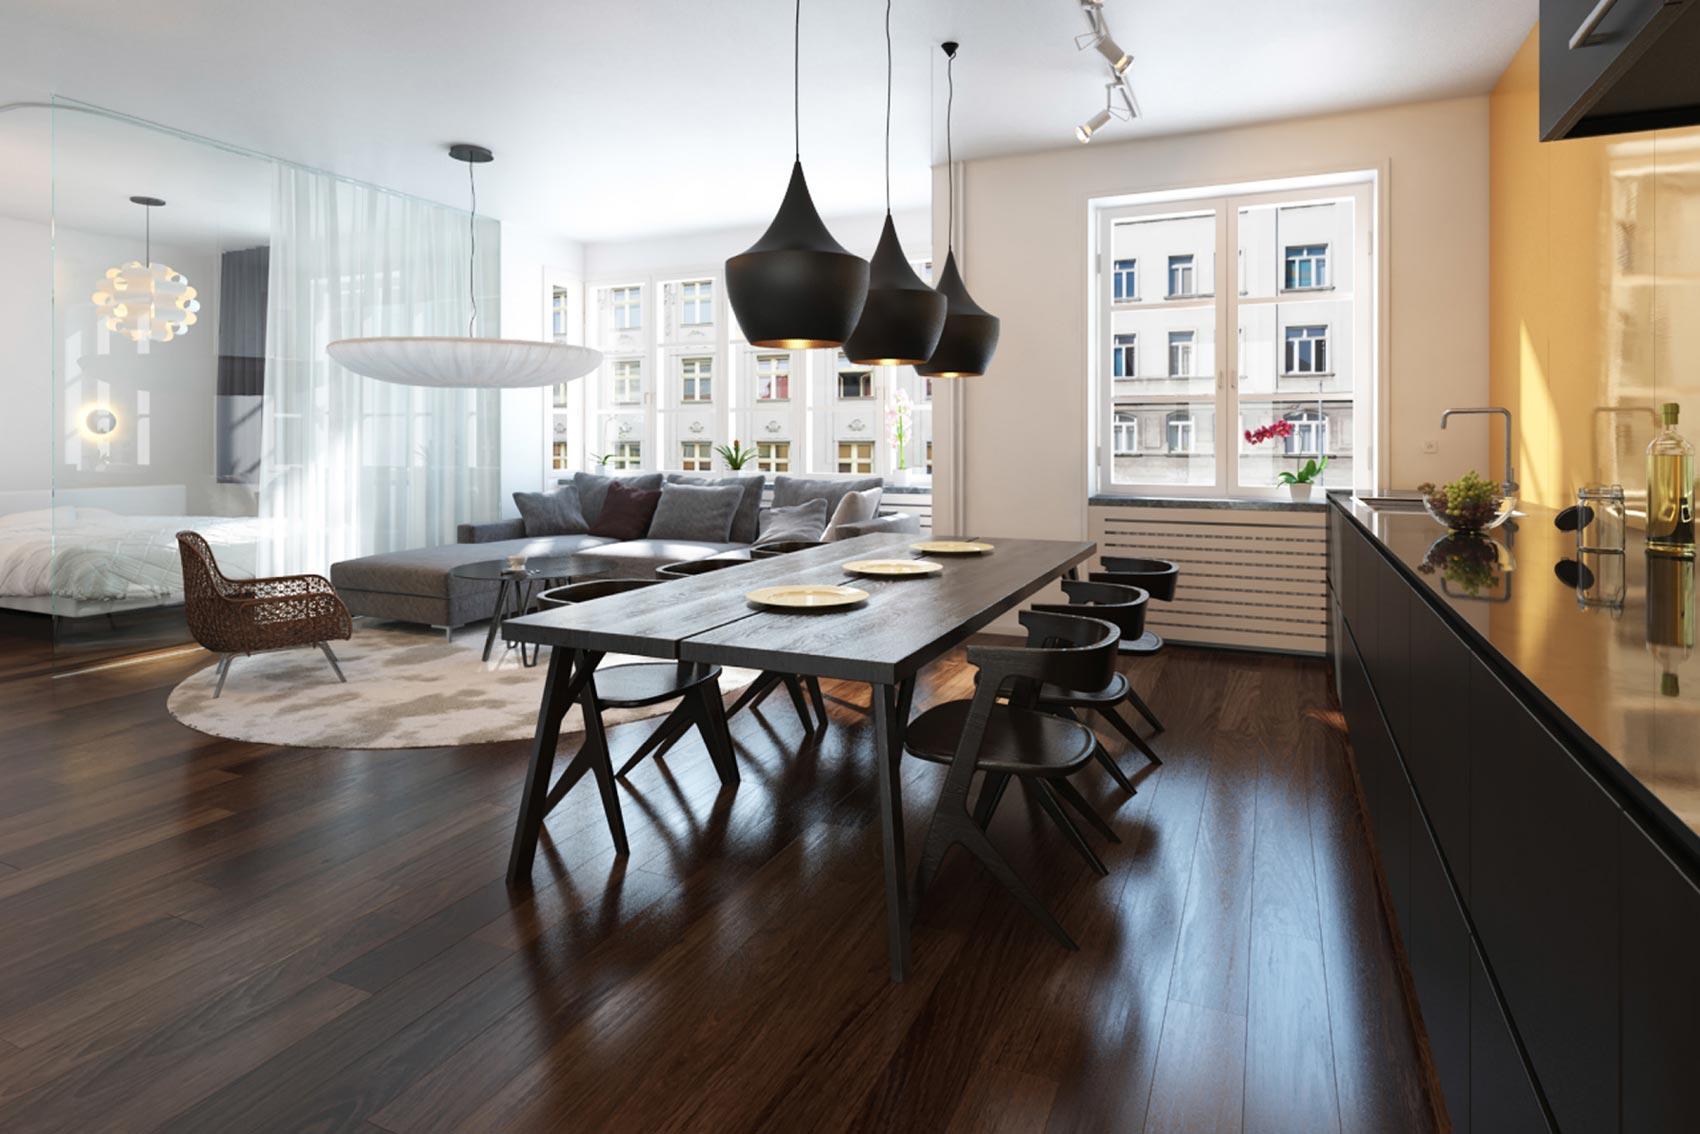 residential property branding agency